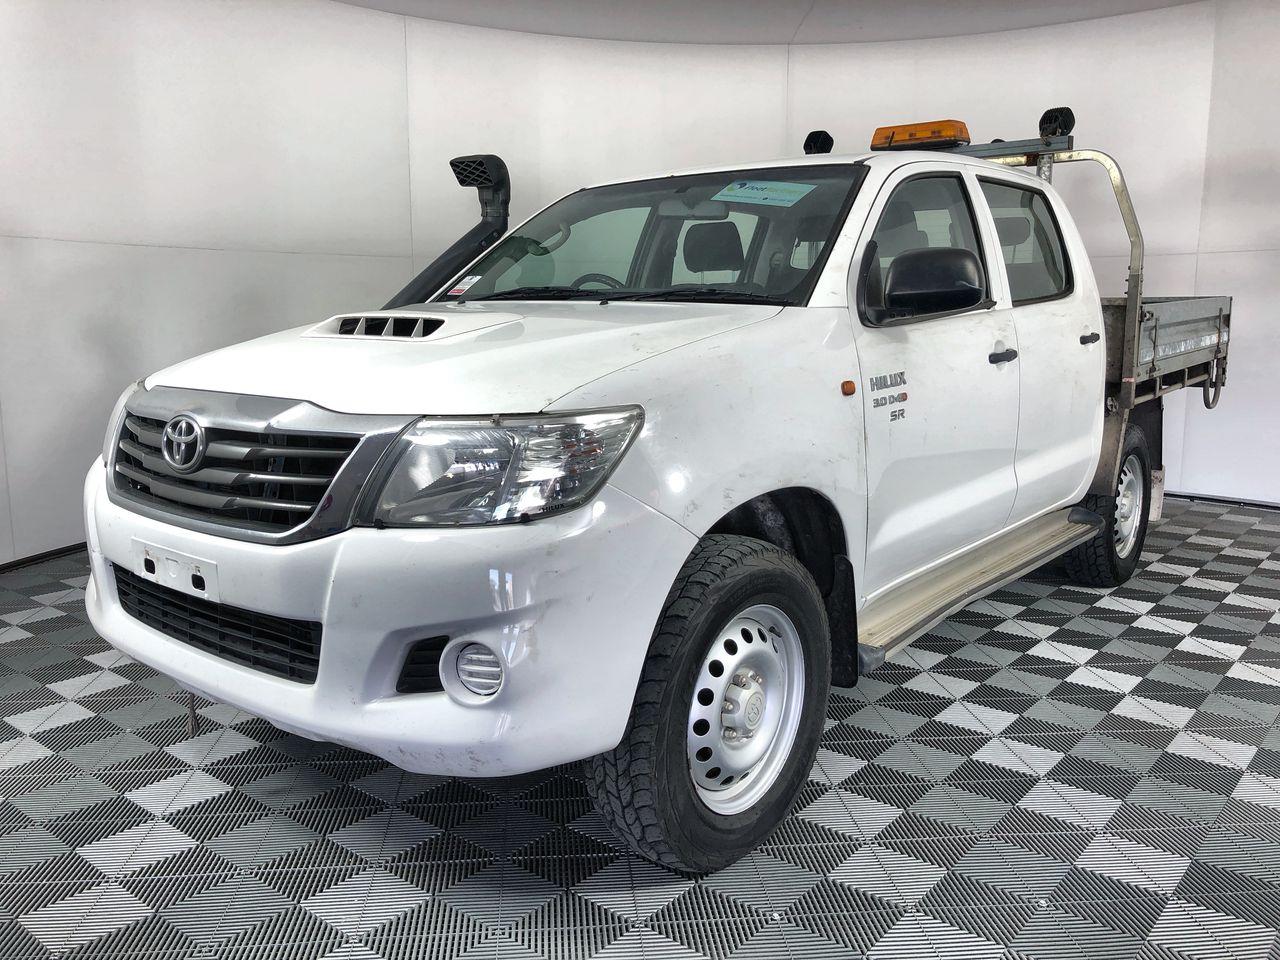 2015 Toyota Hilux SR (4x4) KUN26R Turbo Diesel Automatic Crew Cab Chassis